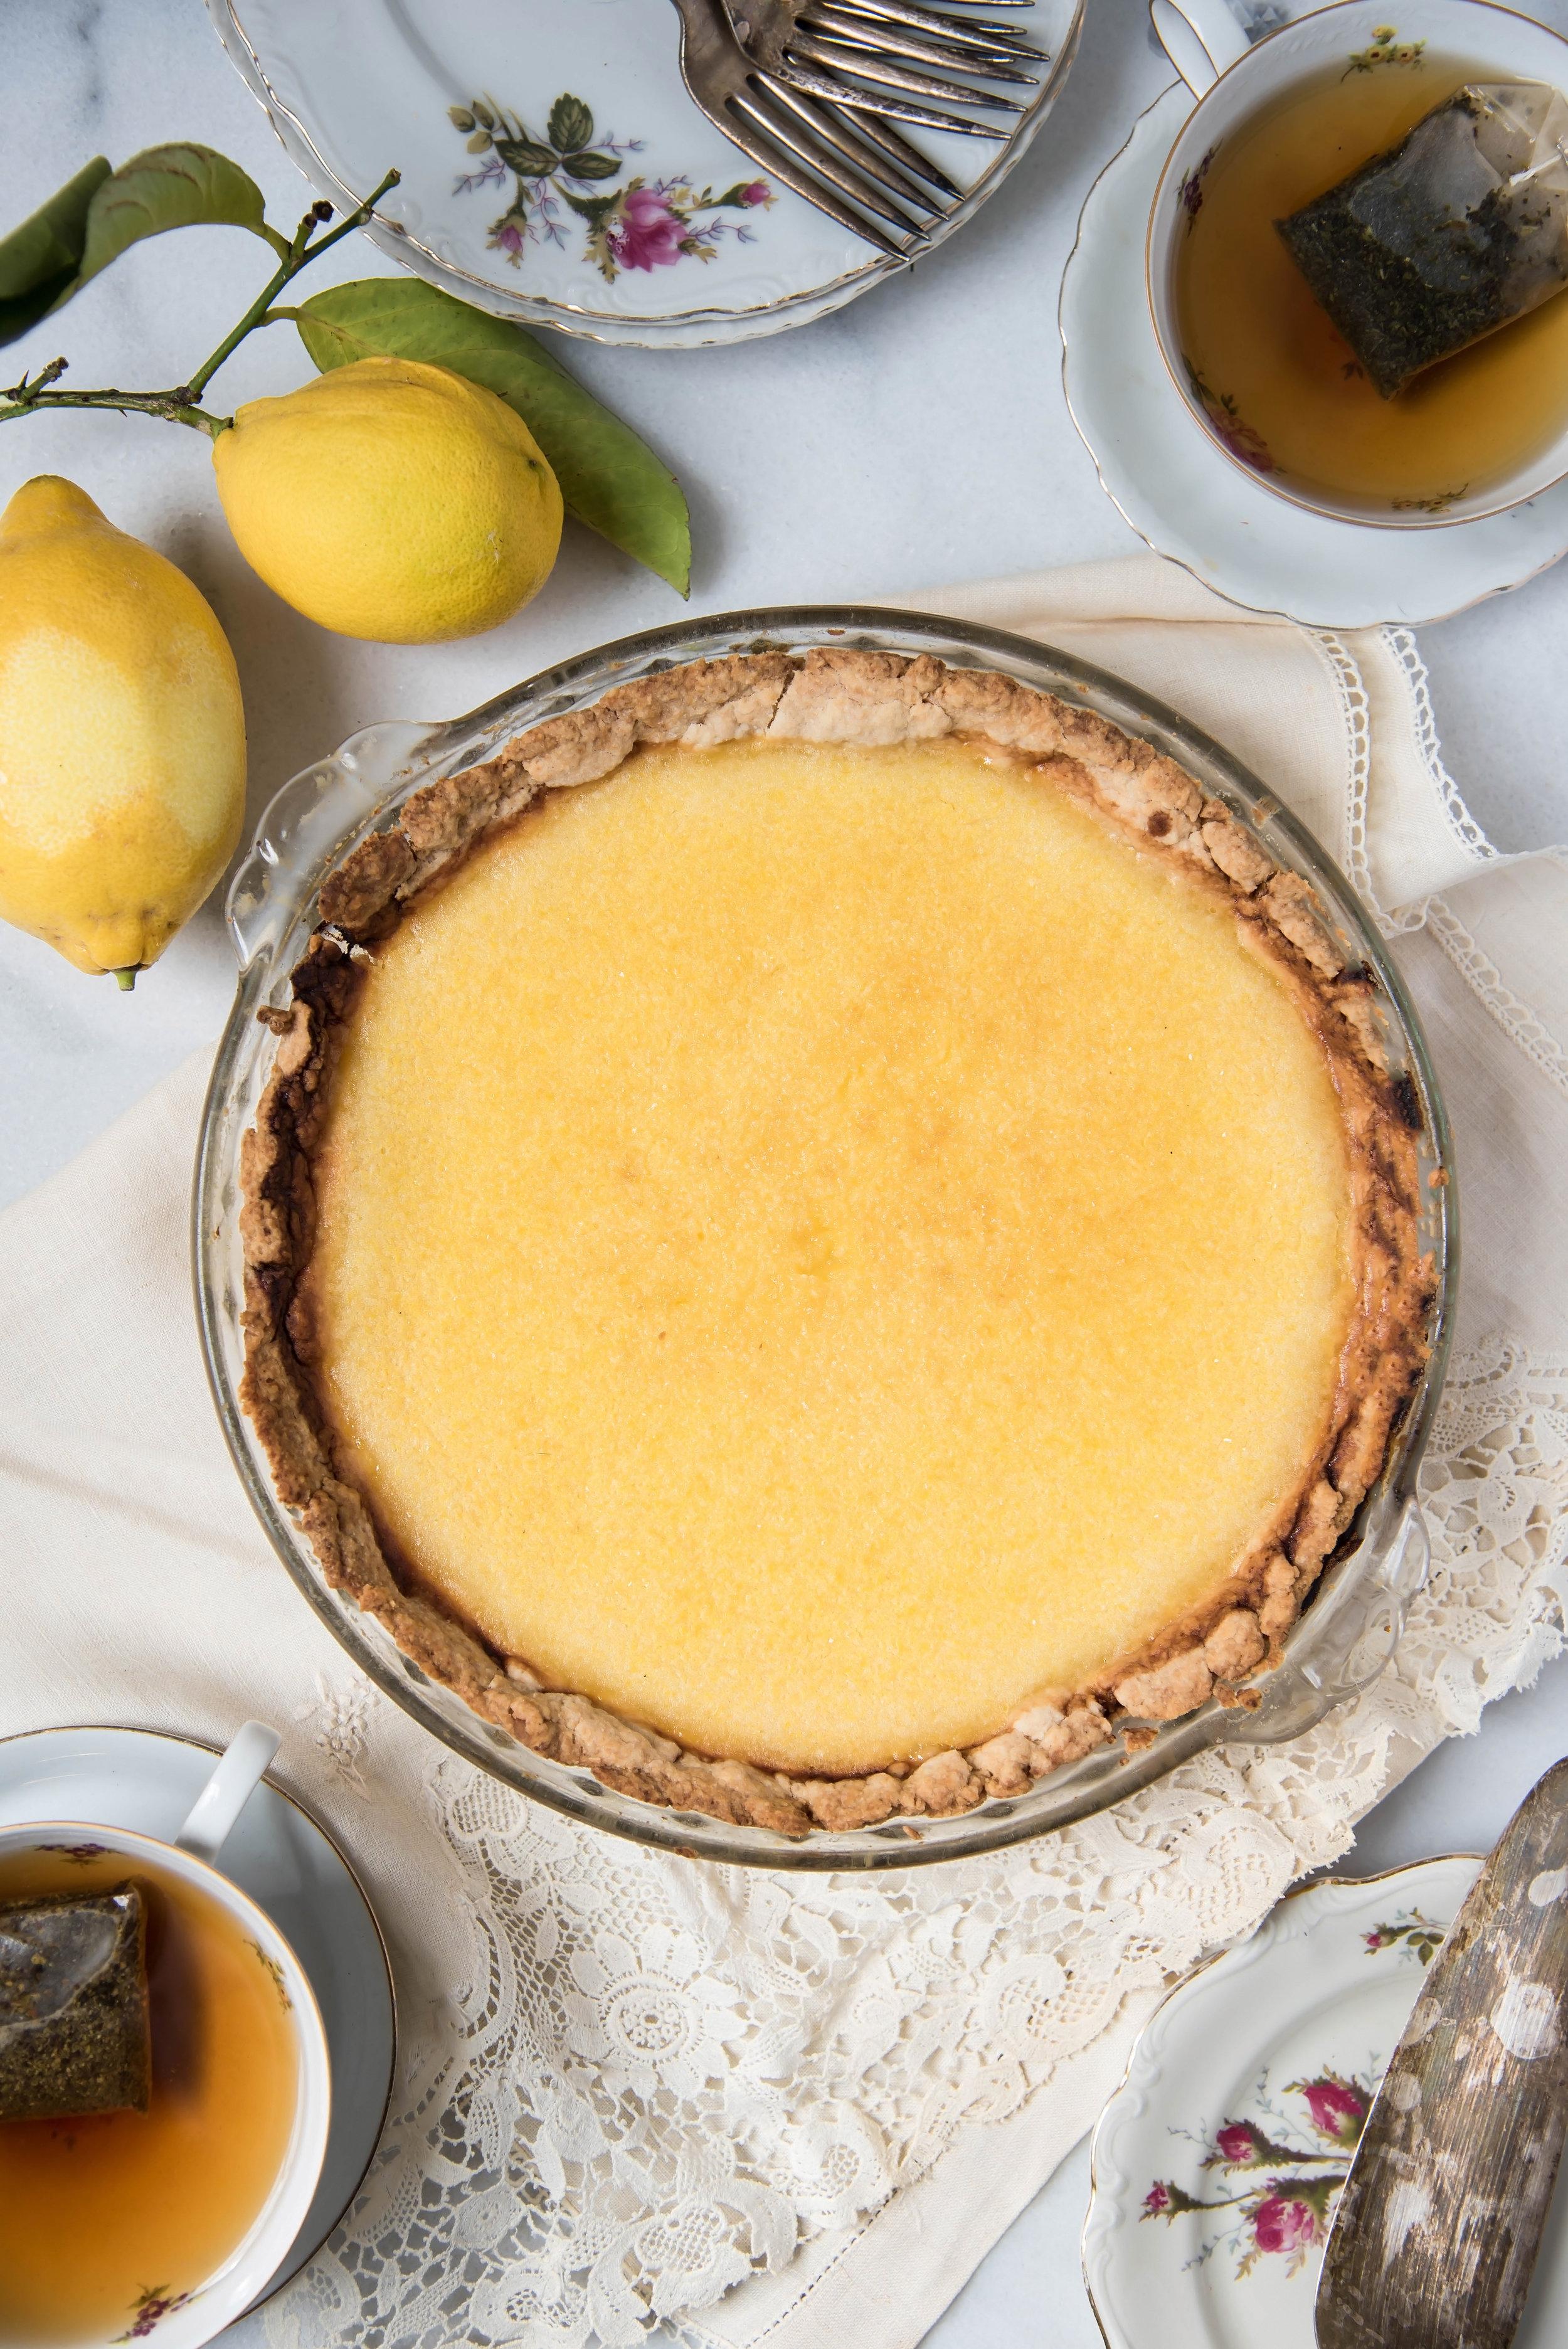 ROSE & IVY Journal Coconut Lemon Chess Pie